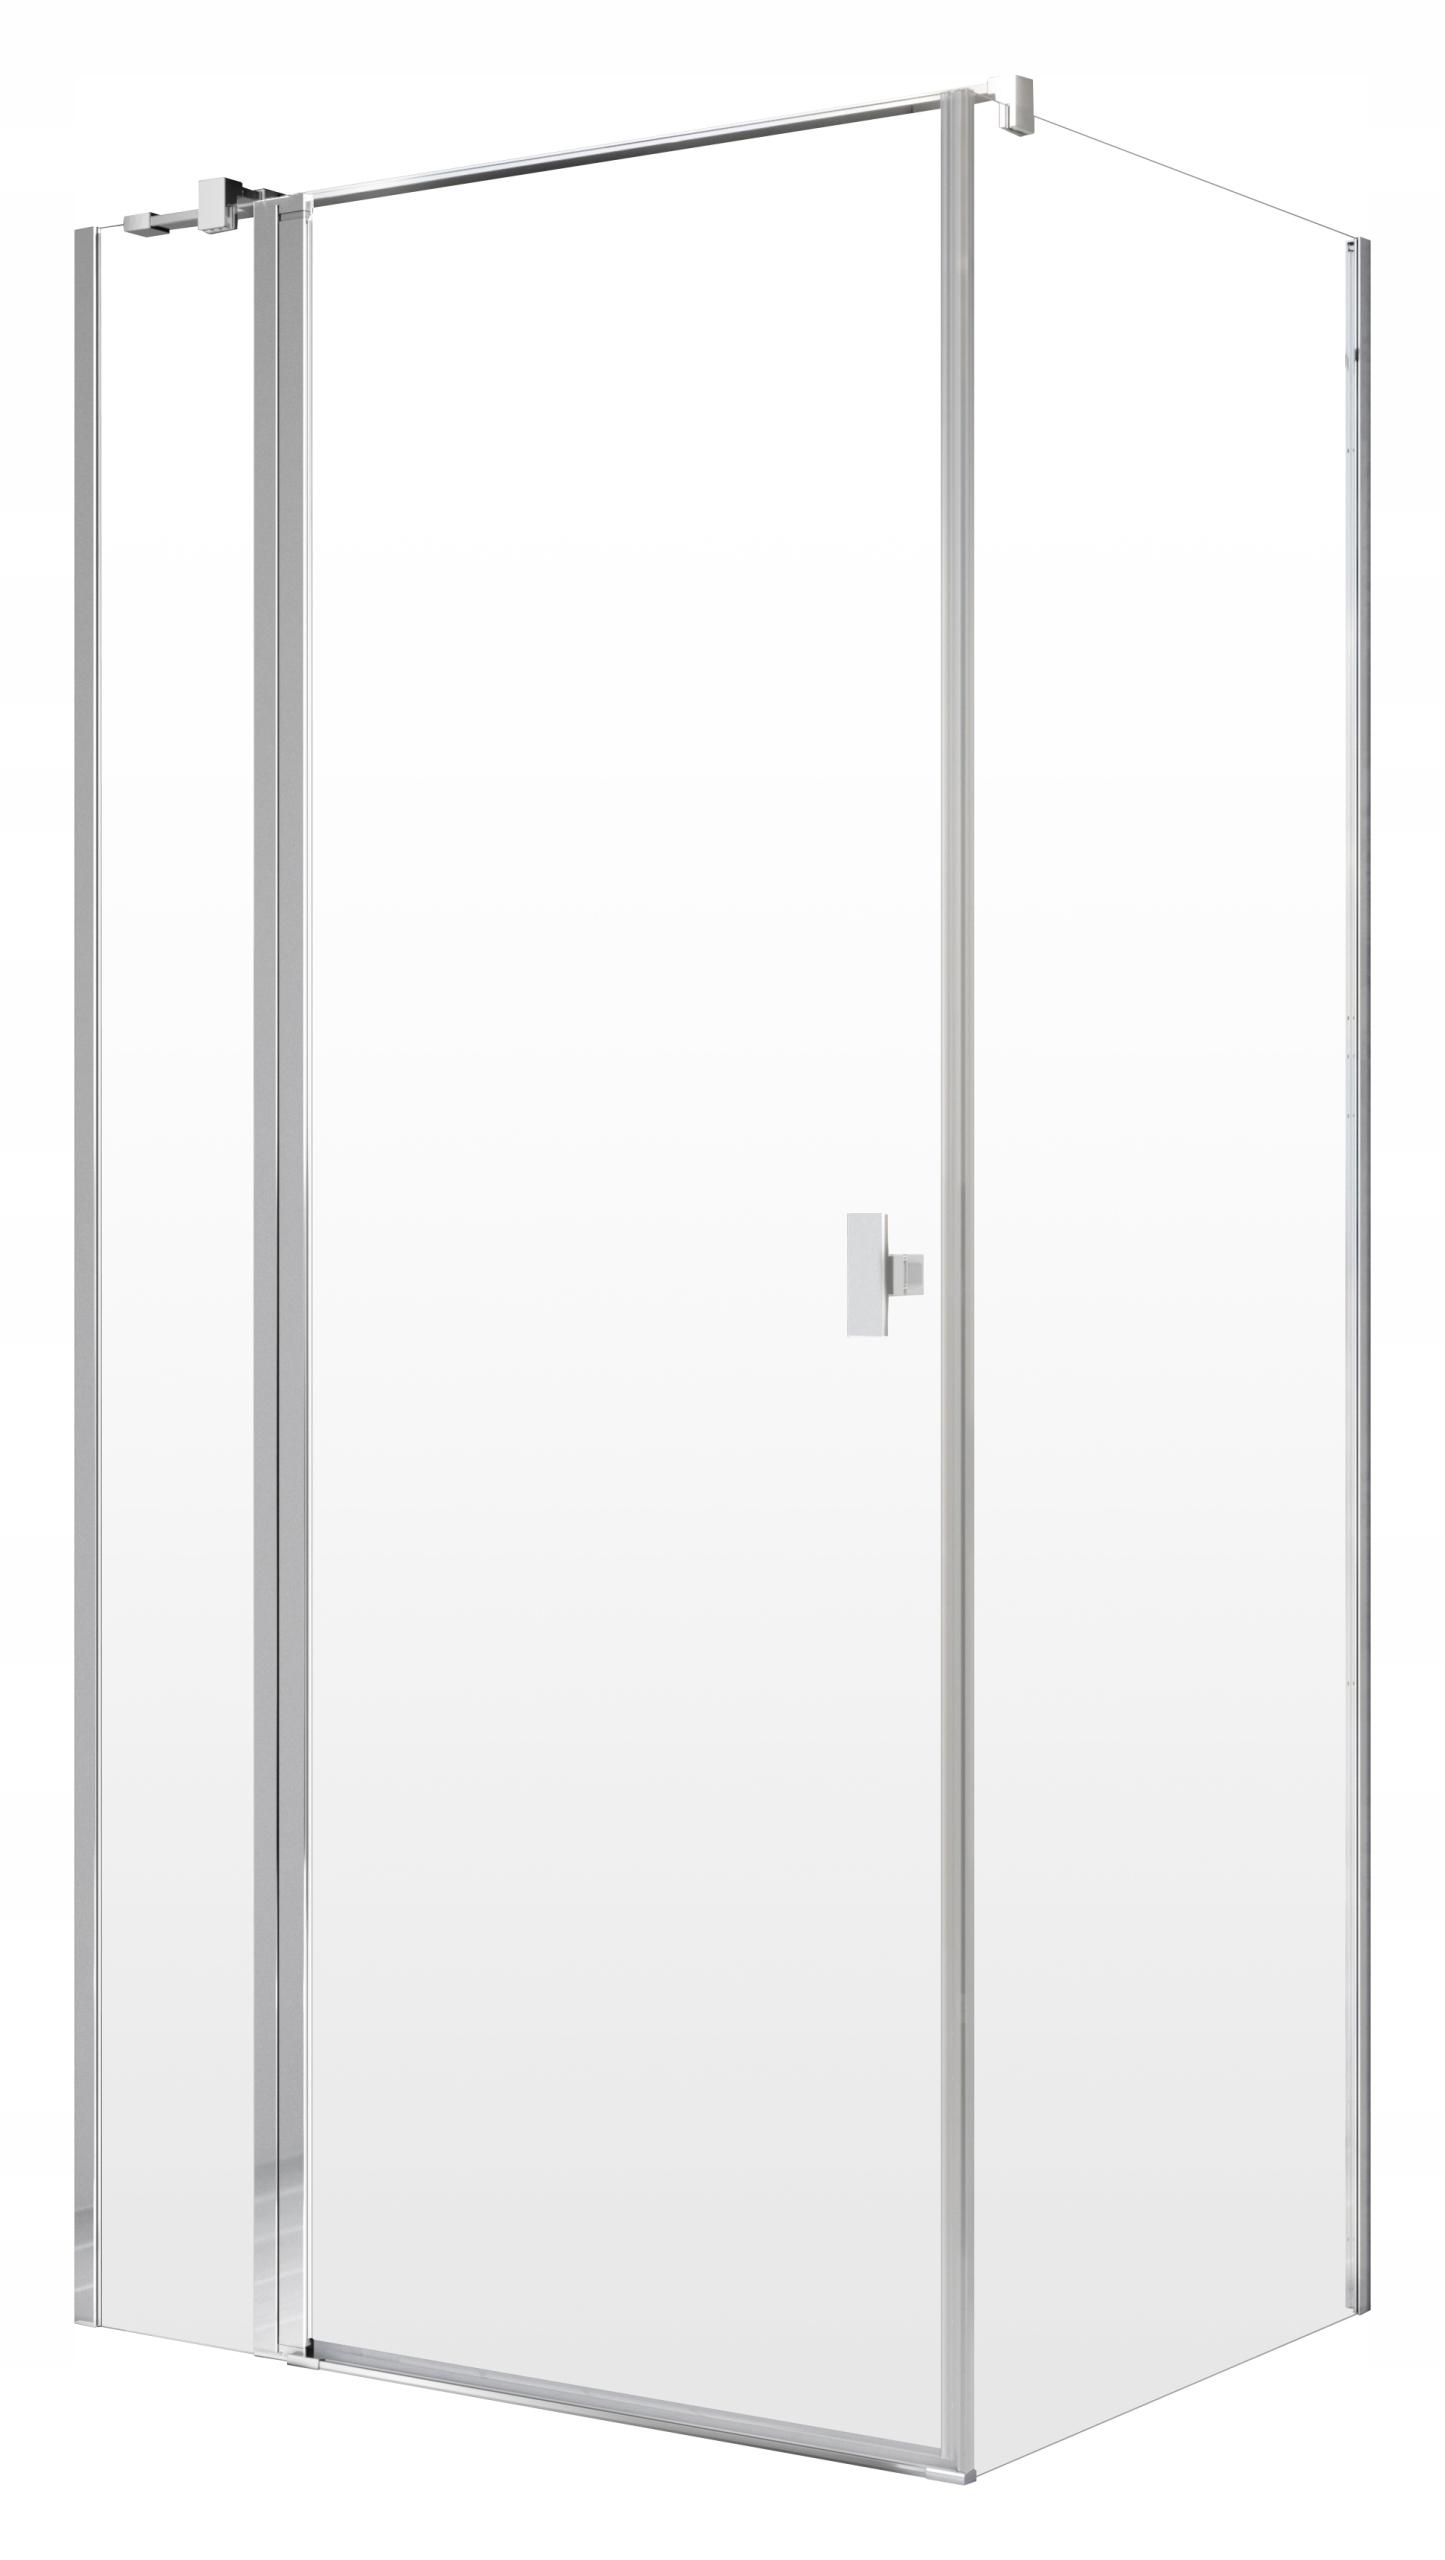 Sprcha Nes II KDJ RADAWAY 120x100x200